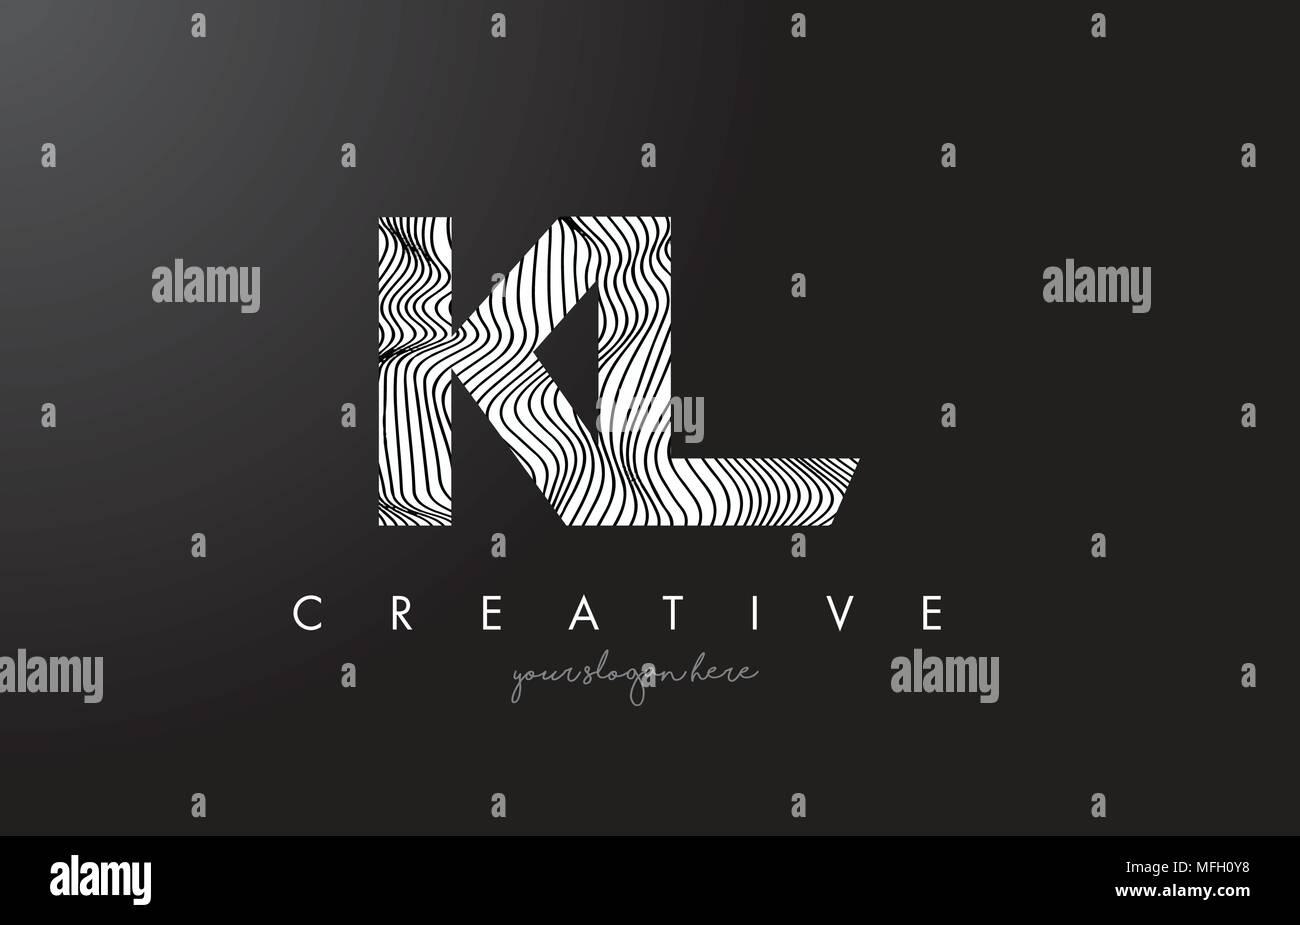 KL K L Letter Logo with Zebra Lines Texture Design Vector Illustration. - Stock Vector